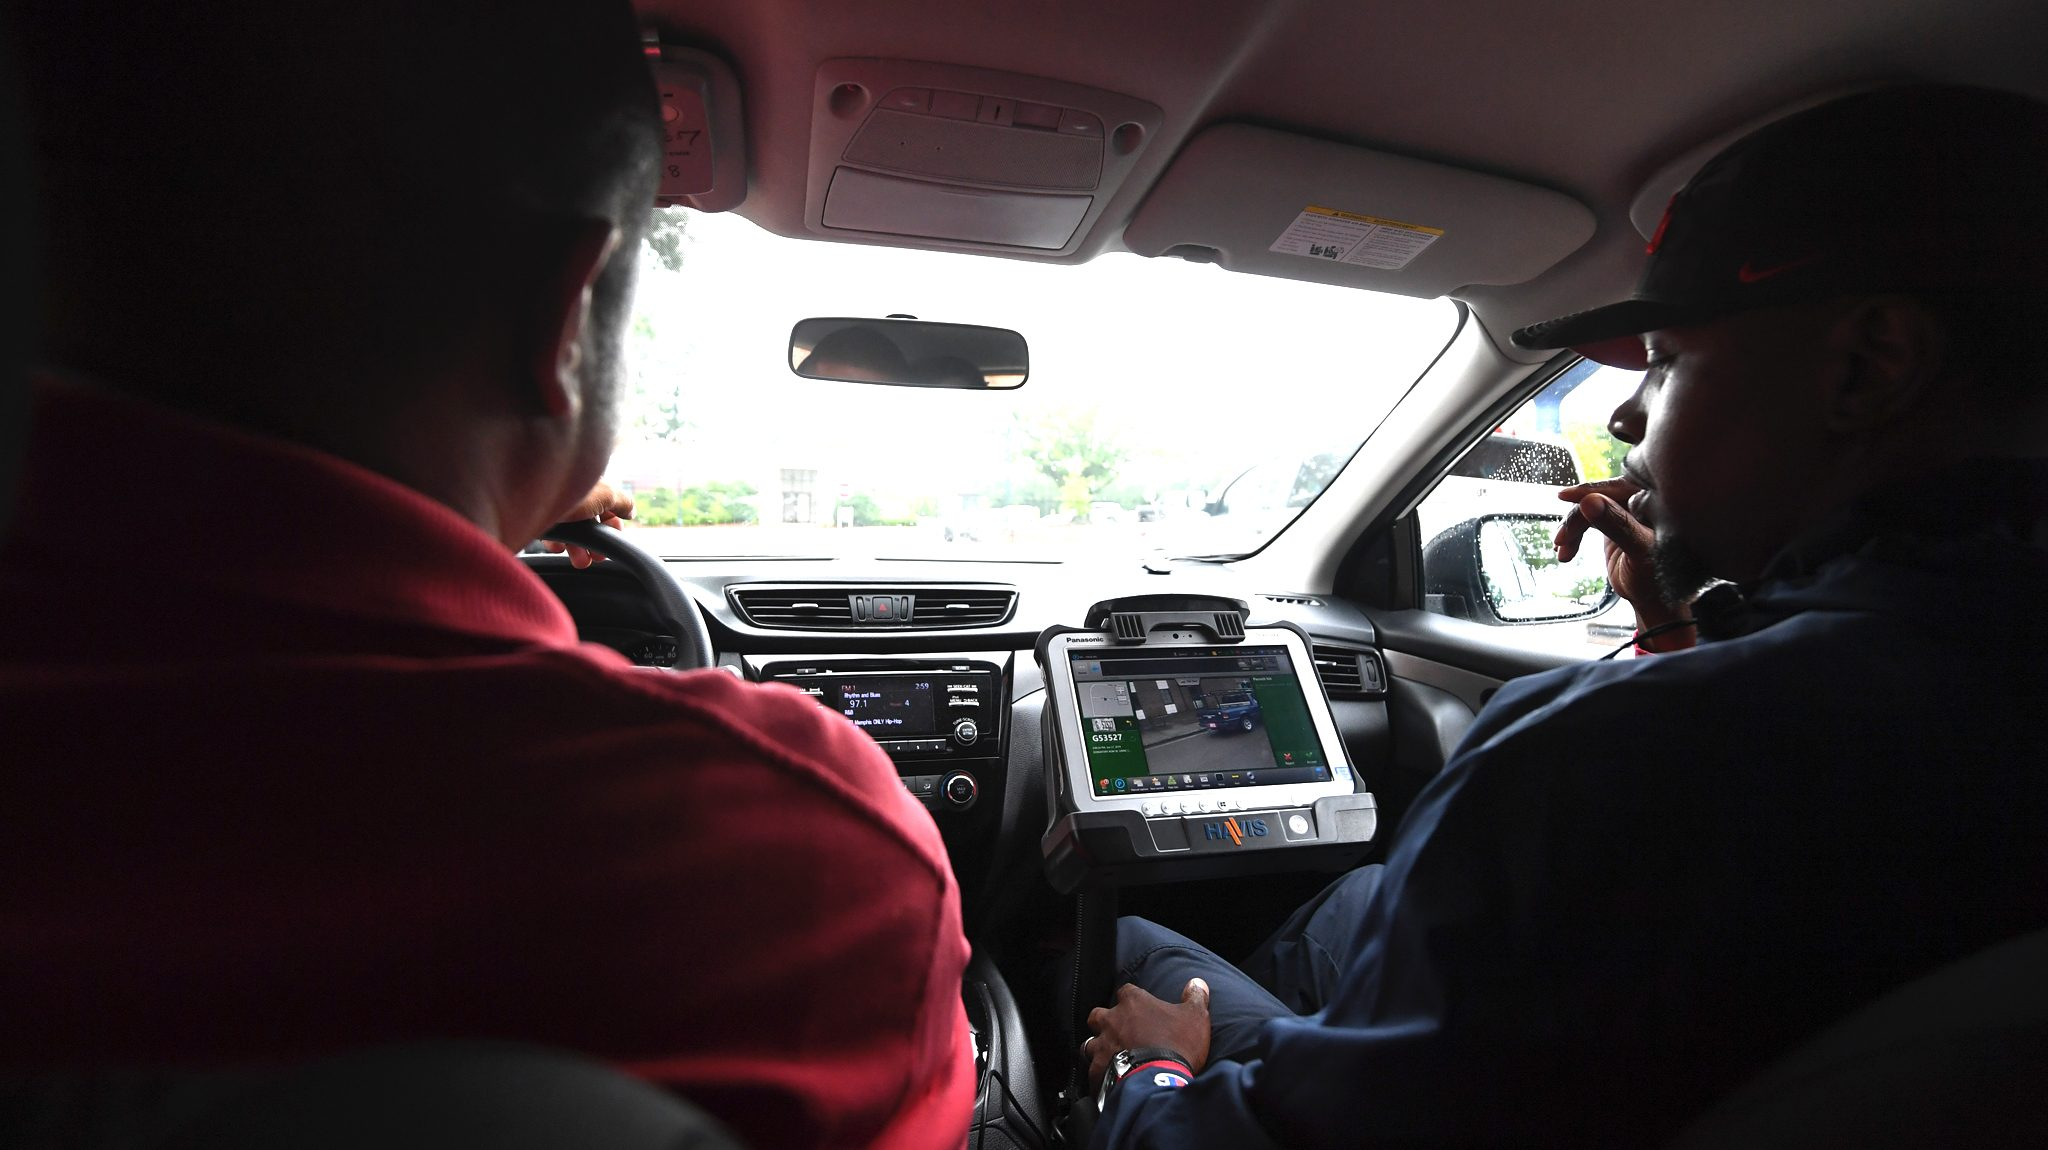 University Parking Tests License Plate Scanning Technology